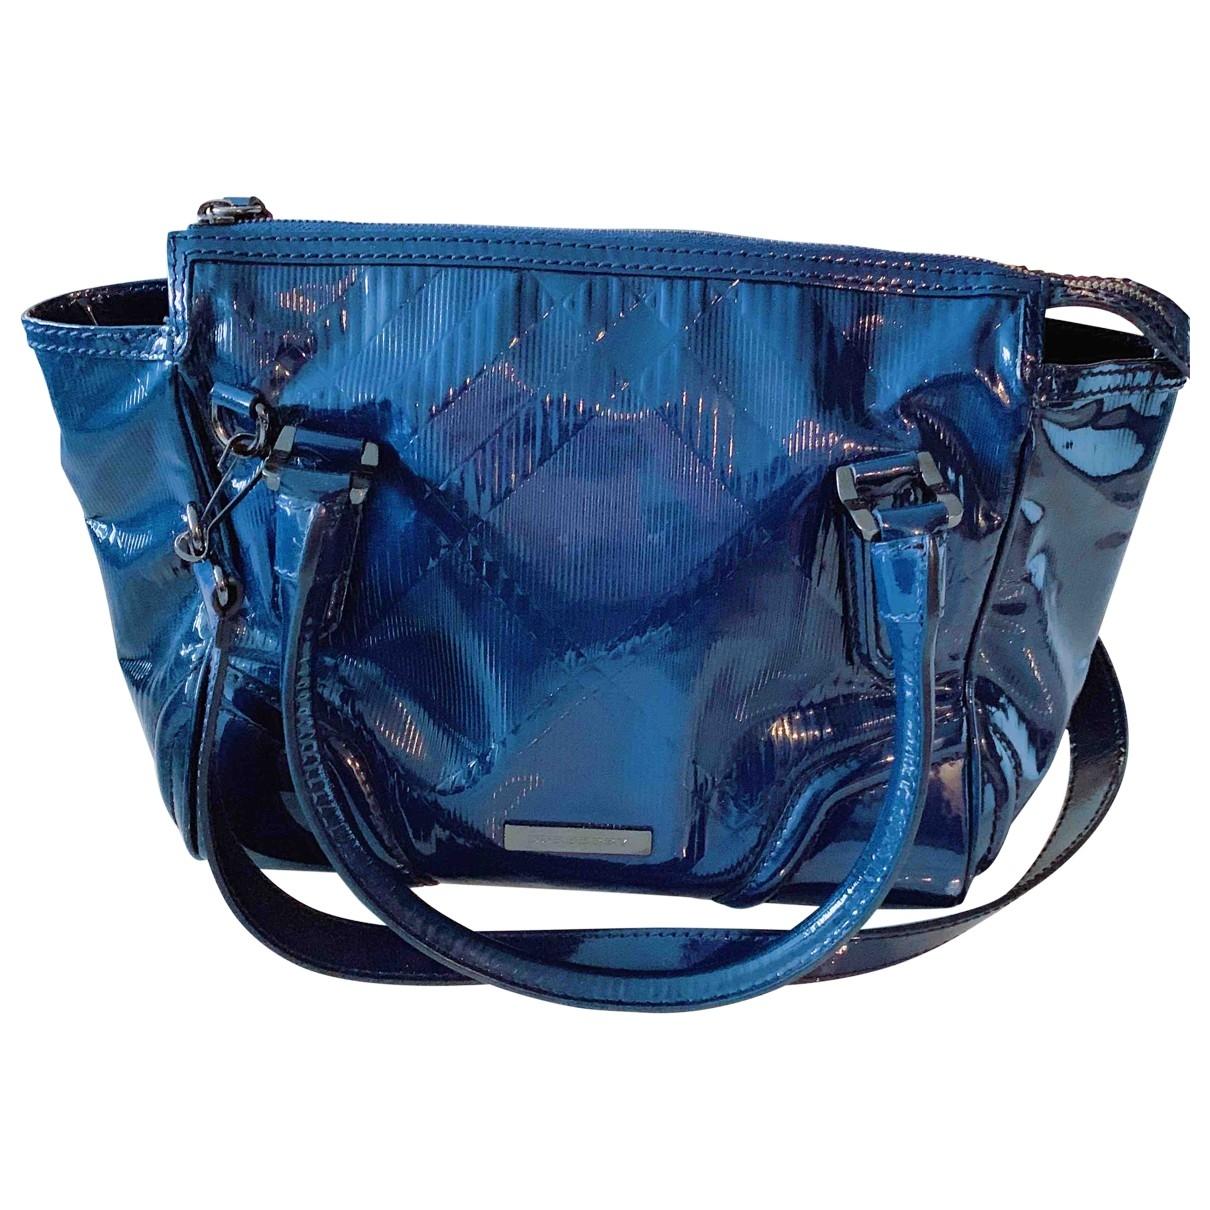 Burberry \N Blue Patent leather handbag for Women \N